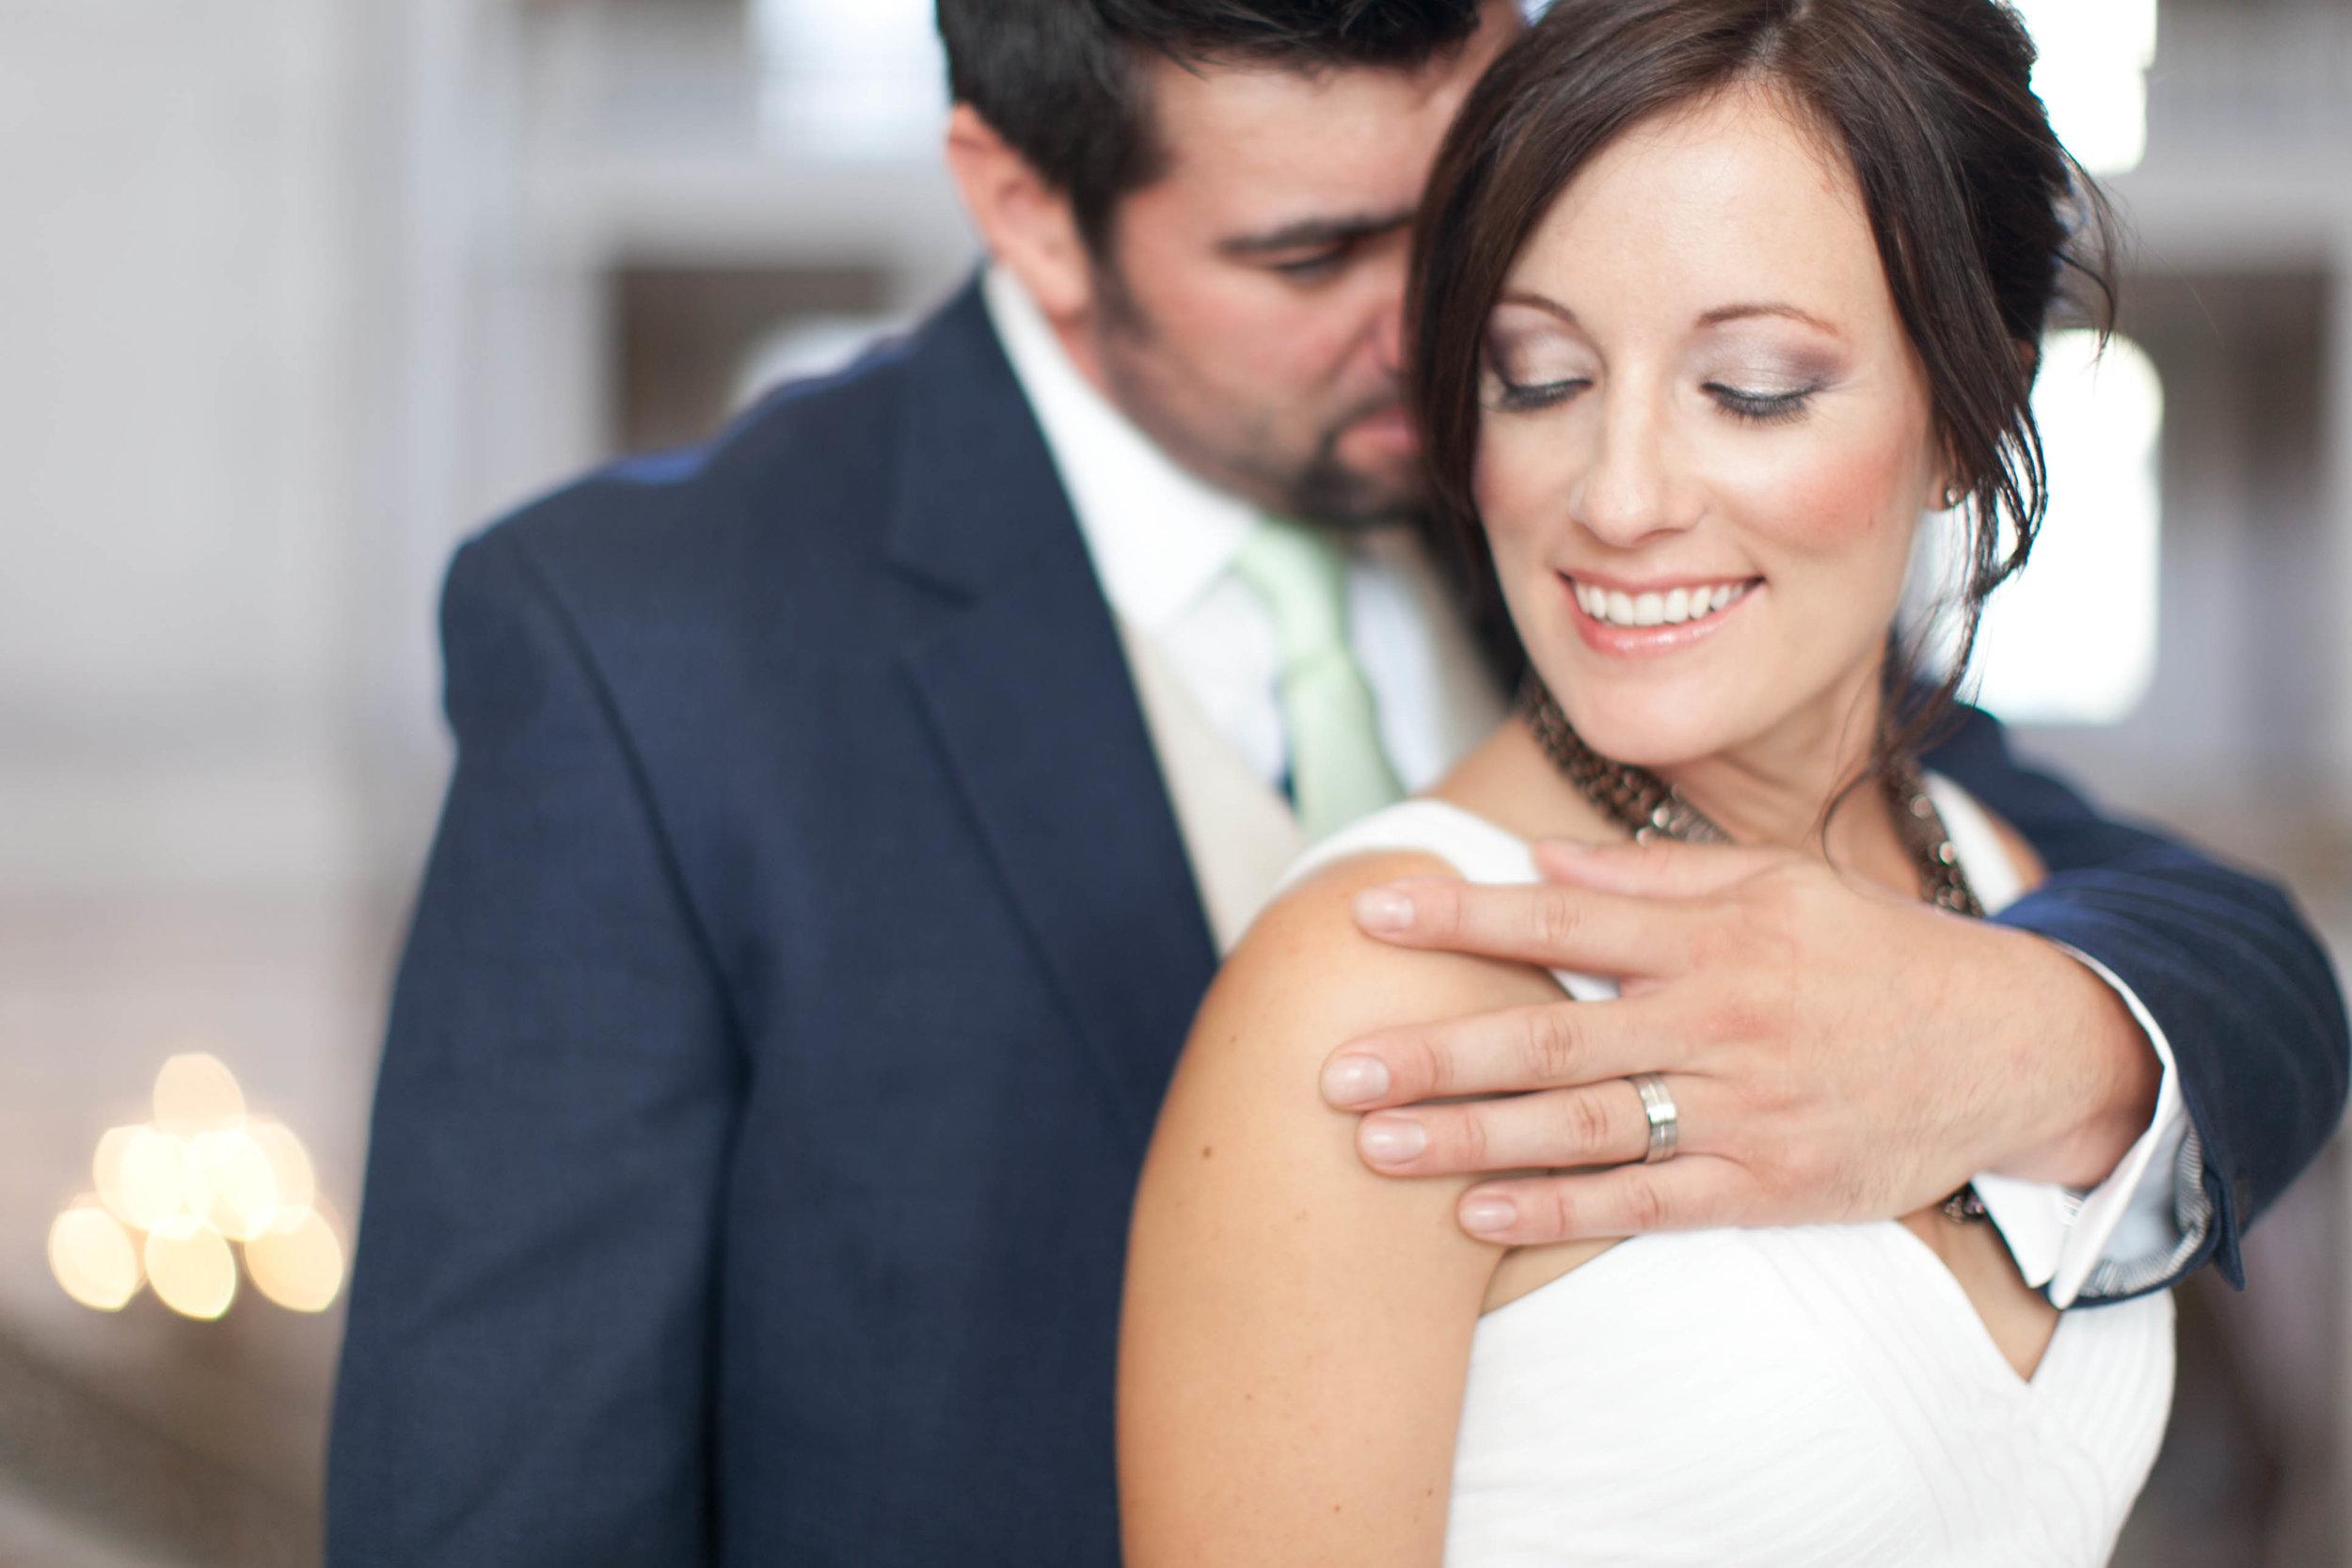 Modern-Love-Photography-wedding-photogrpashy-san-francisco-city-hall-wedding-Photography-257.jpg